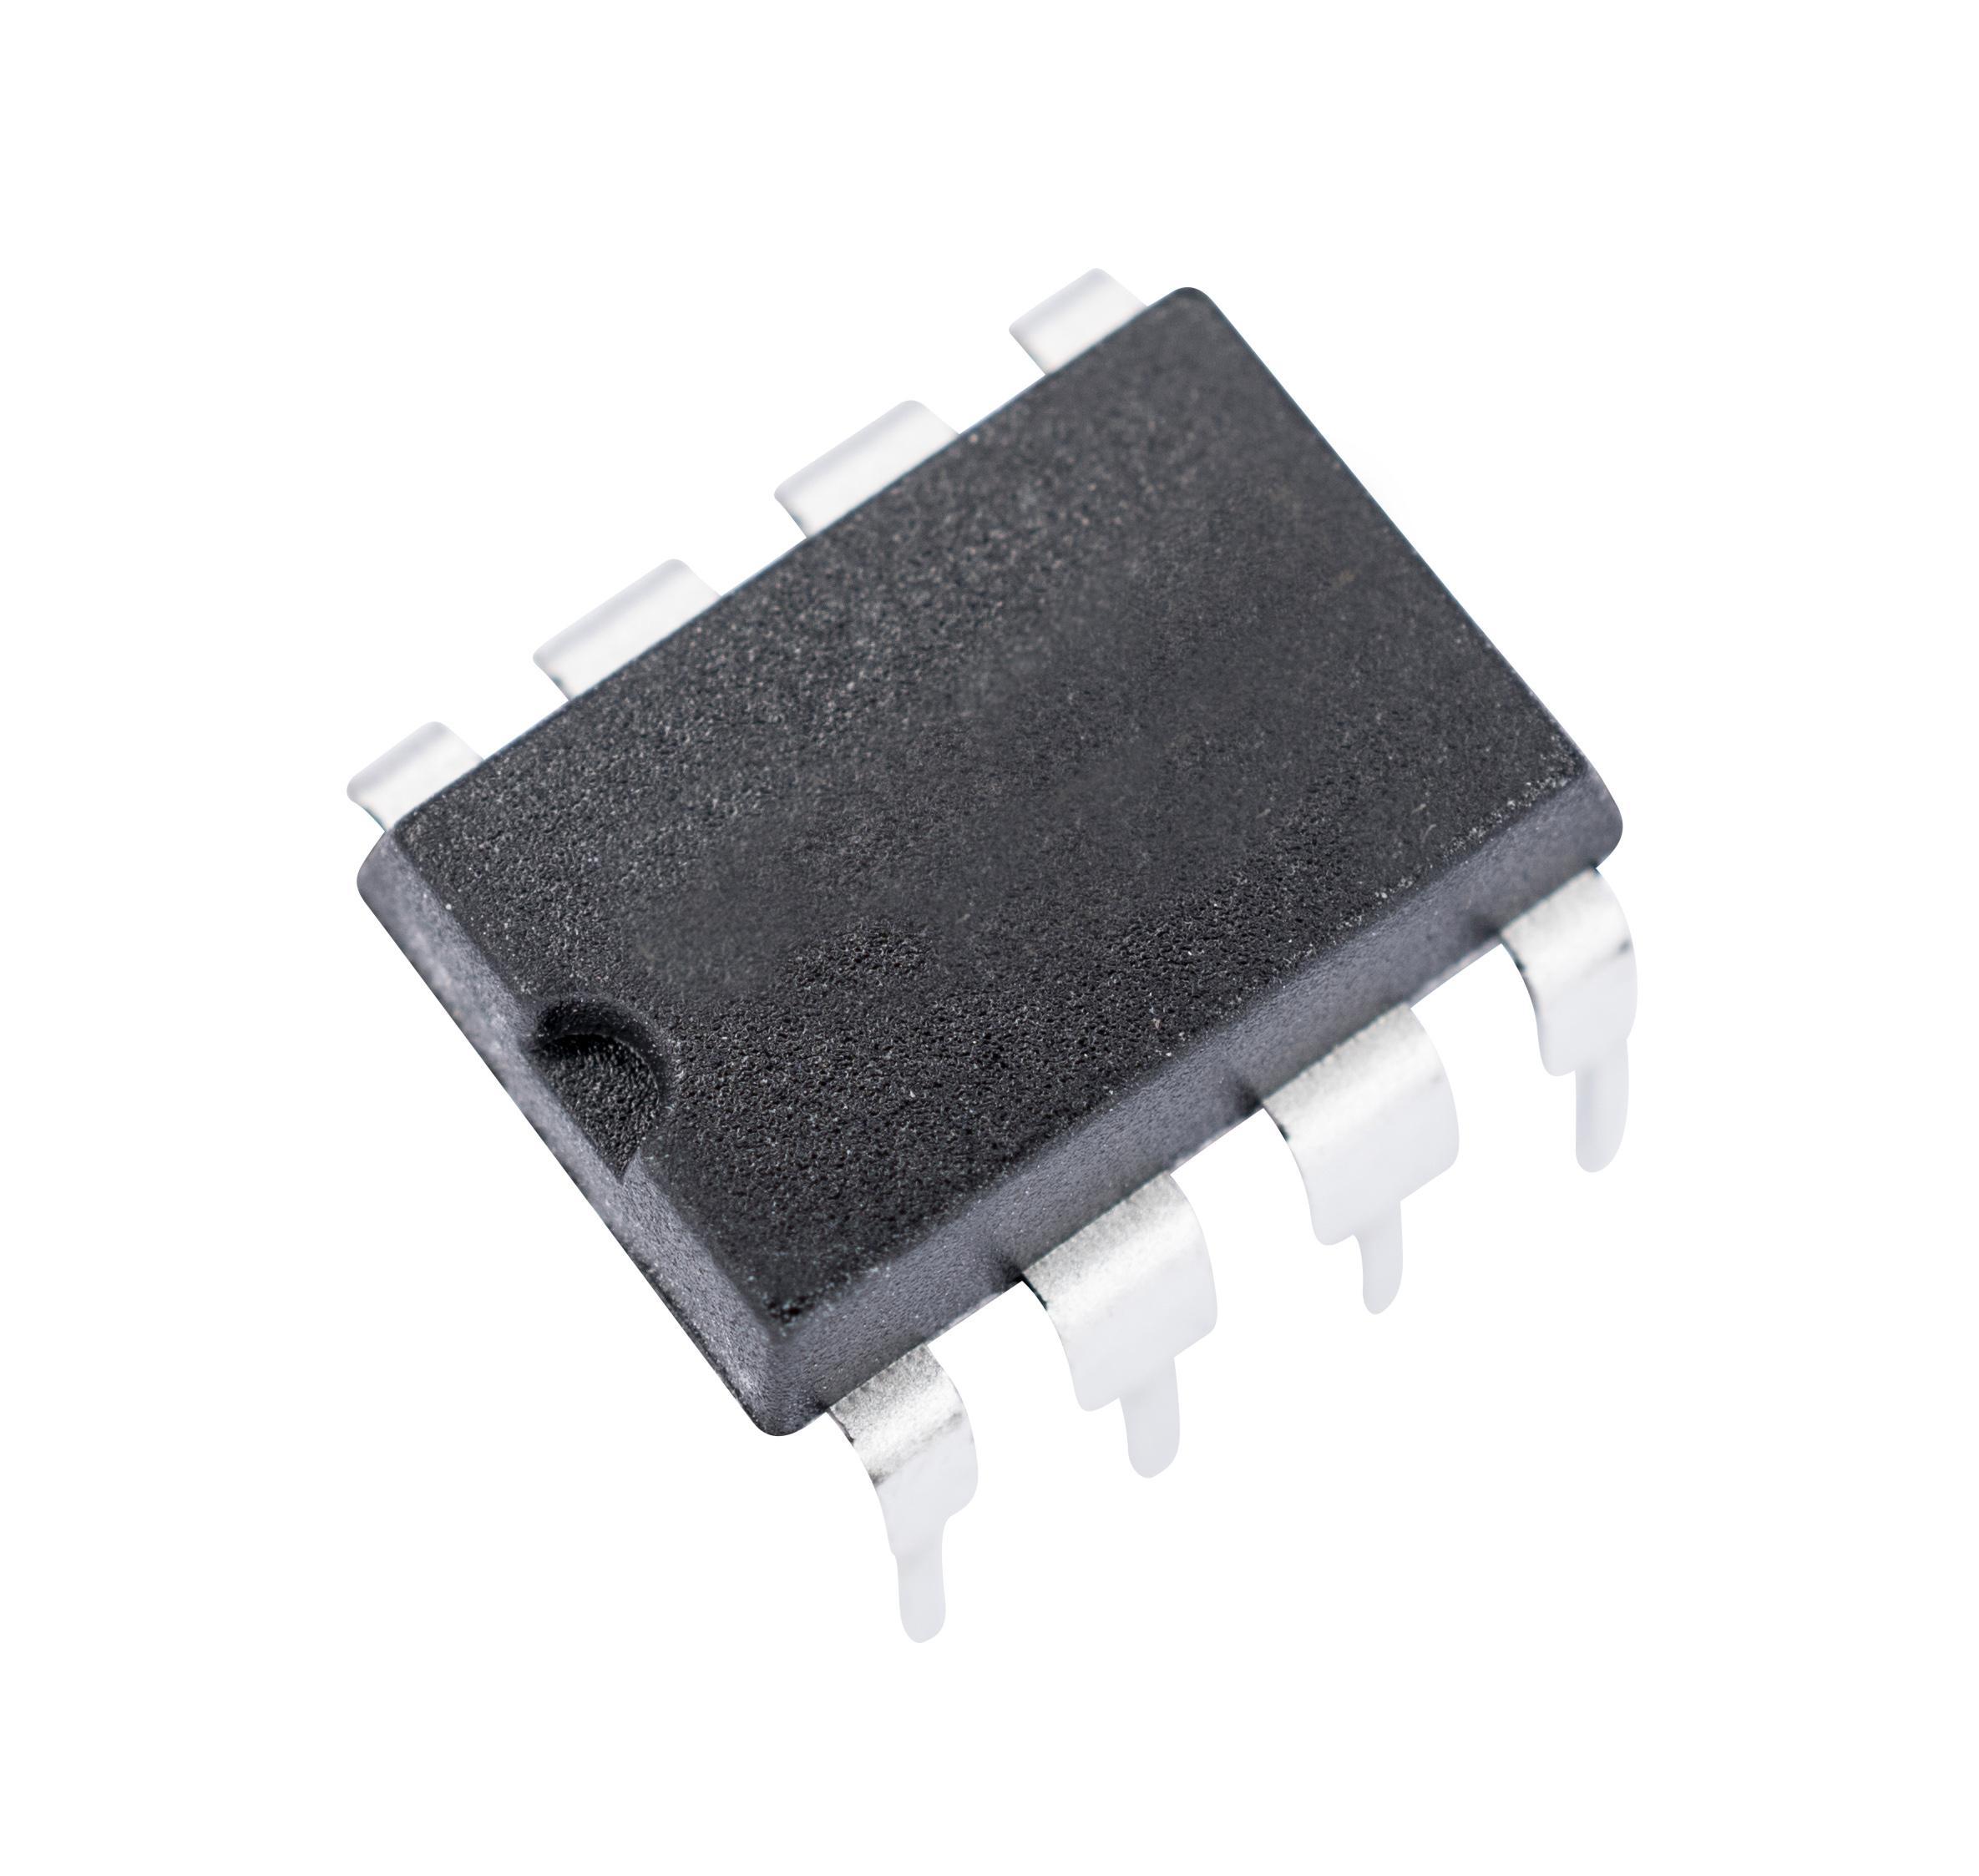 Buy Low Frequency Amplifiers Watt Audio Power Amplifier Circuit Using Tda2613 Kia6225p